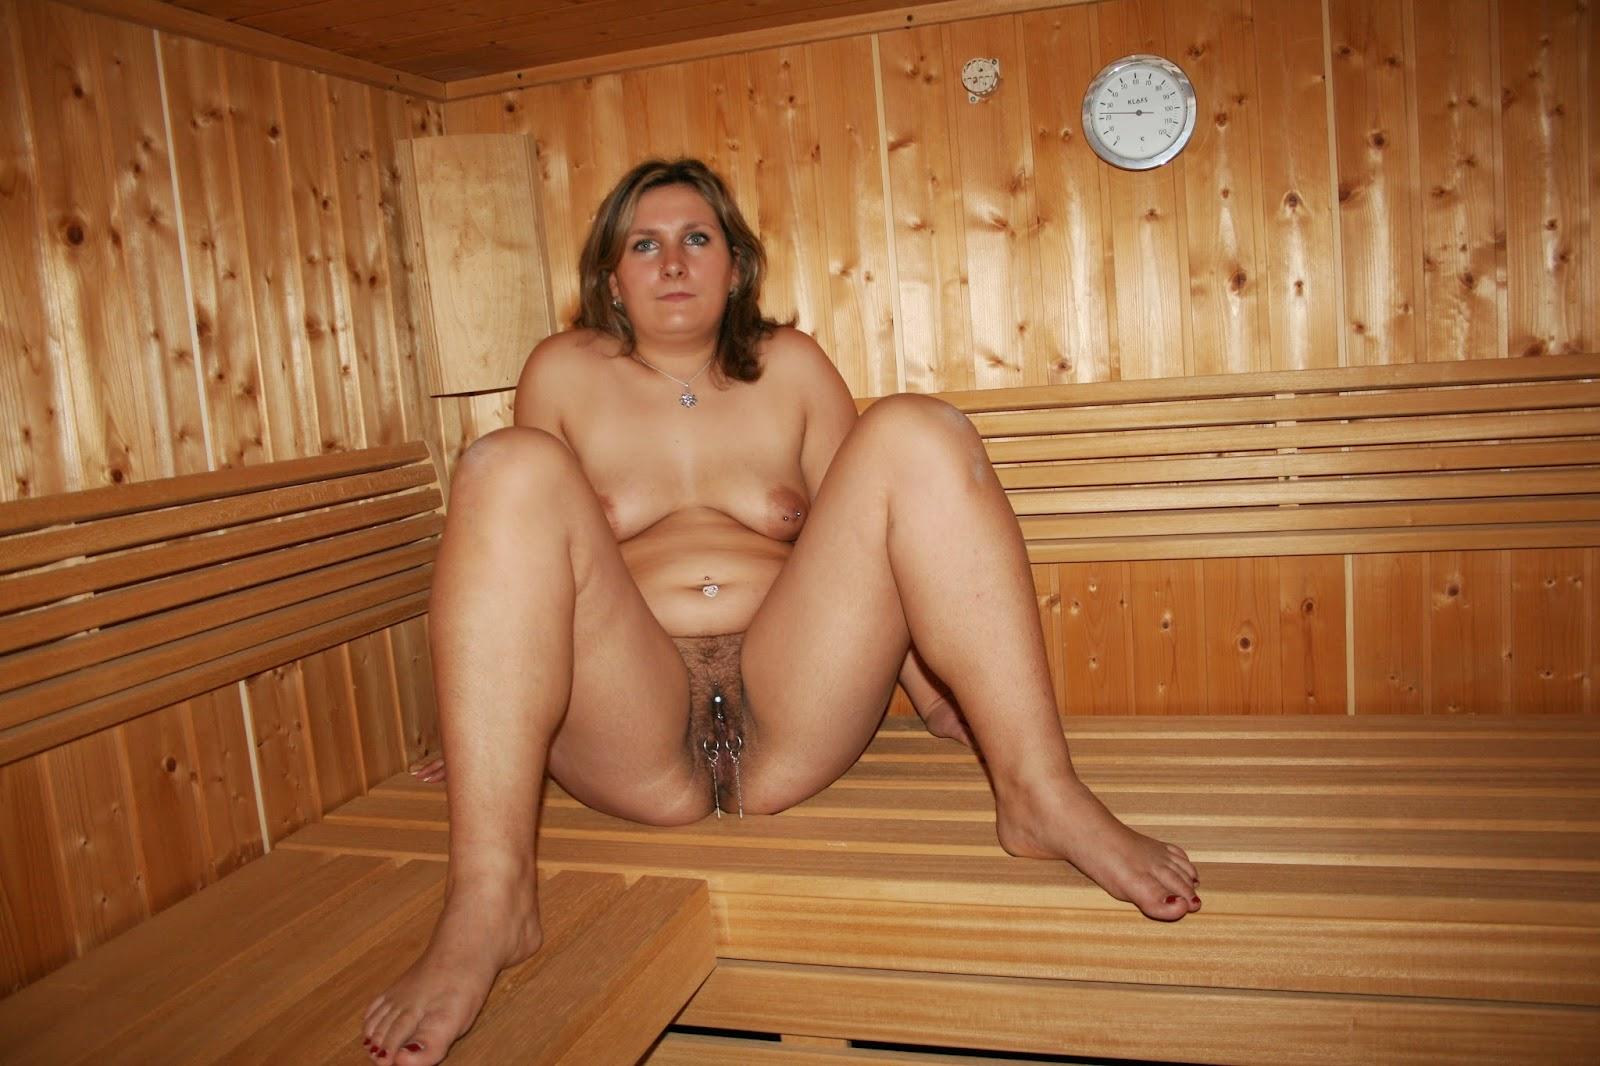 sextreff sauna ganze pornofilme gratis